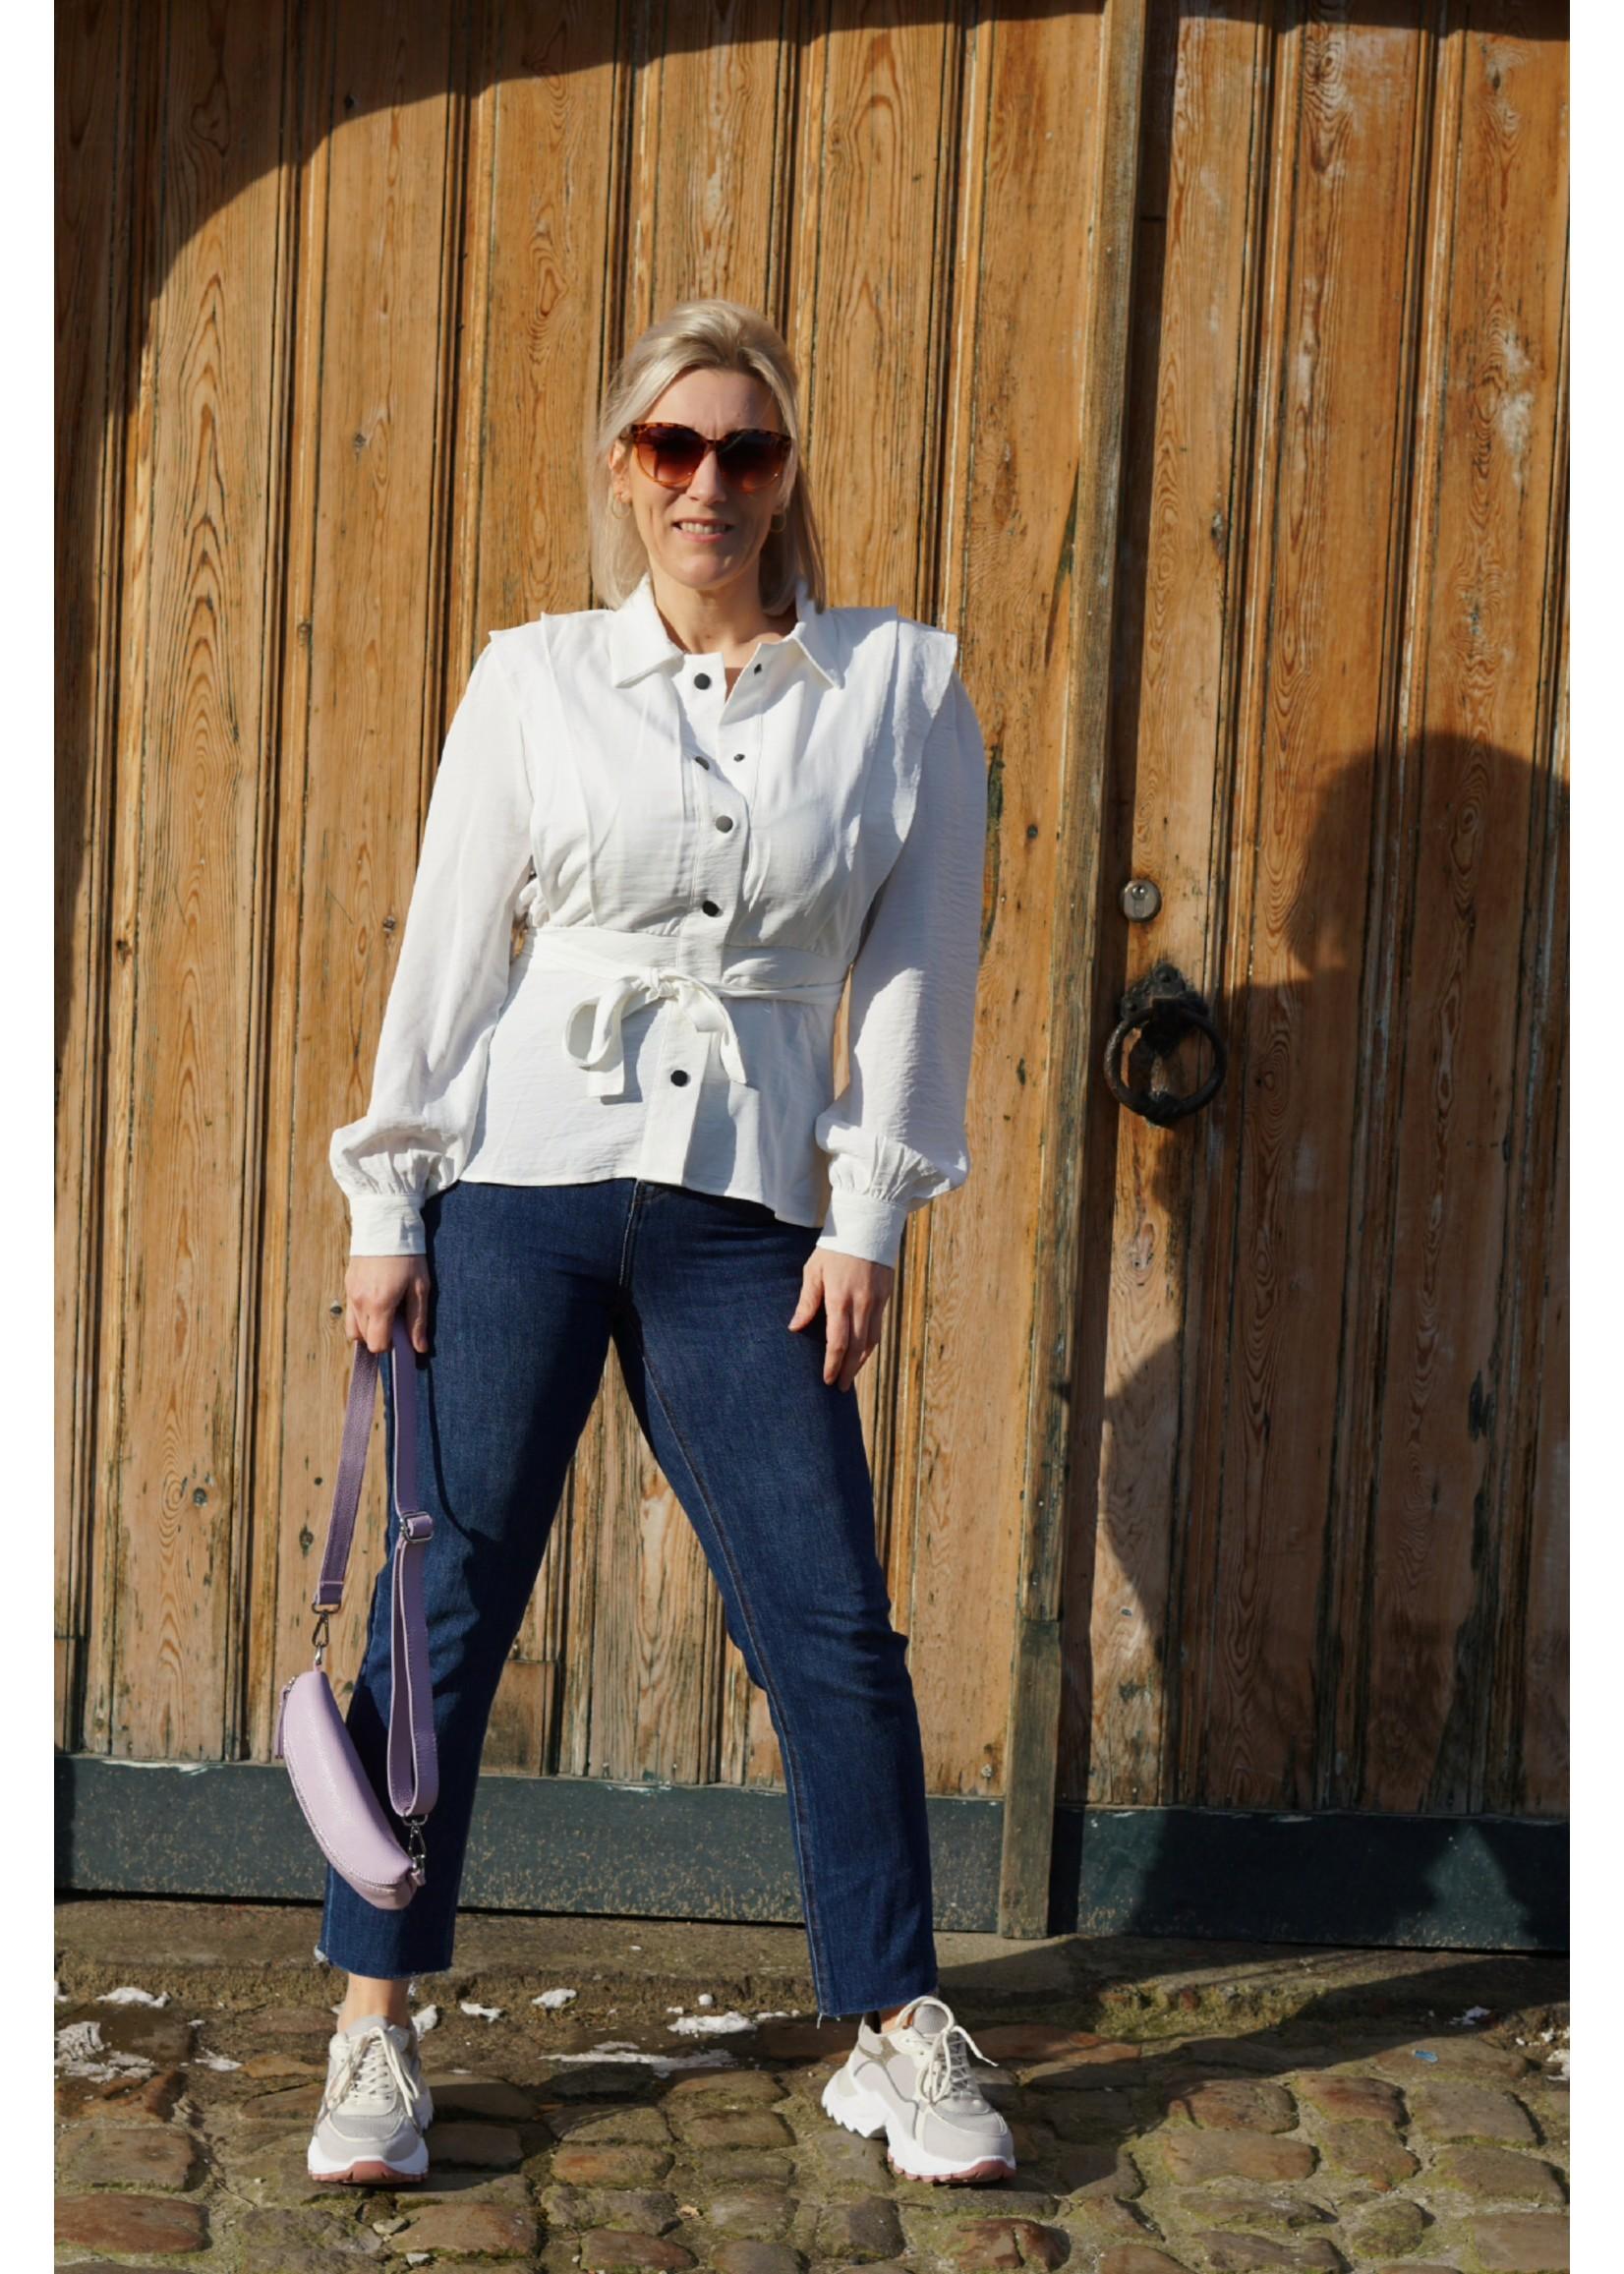 Lofty Manner Blouse fashion white